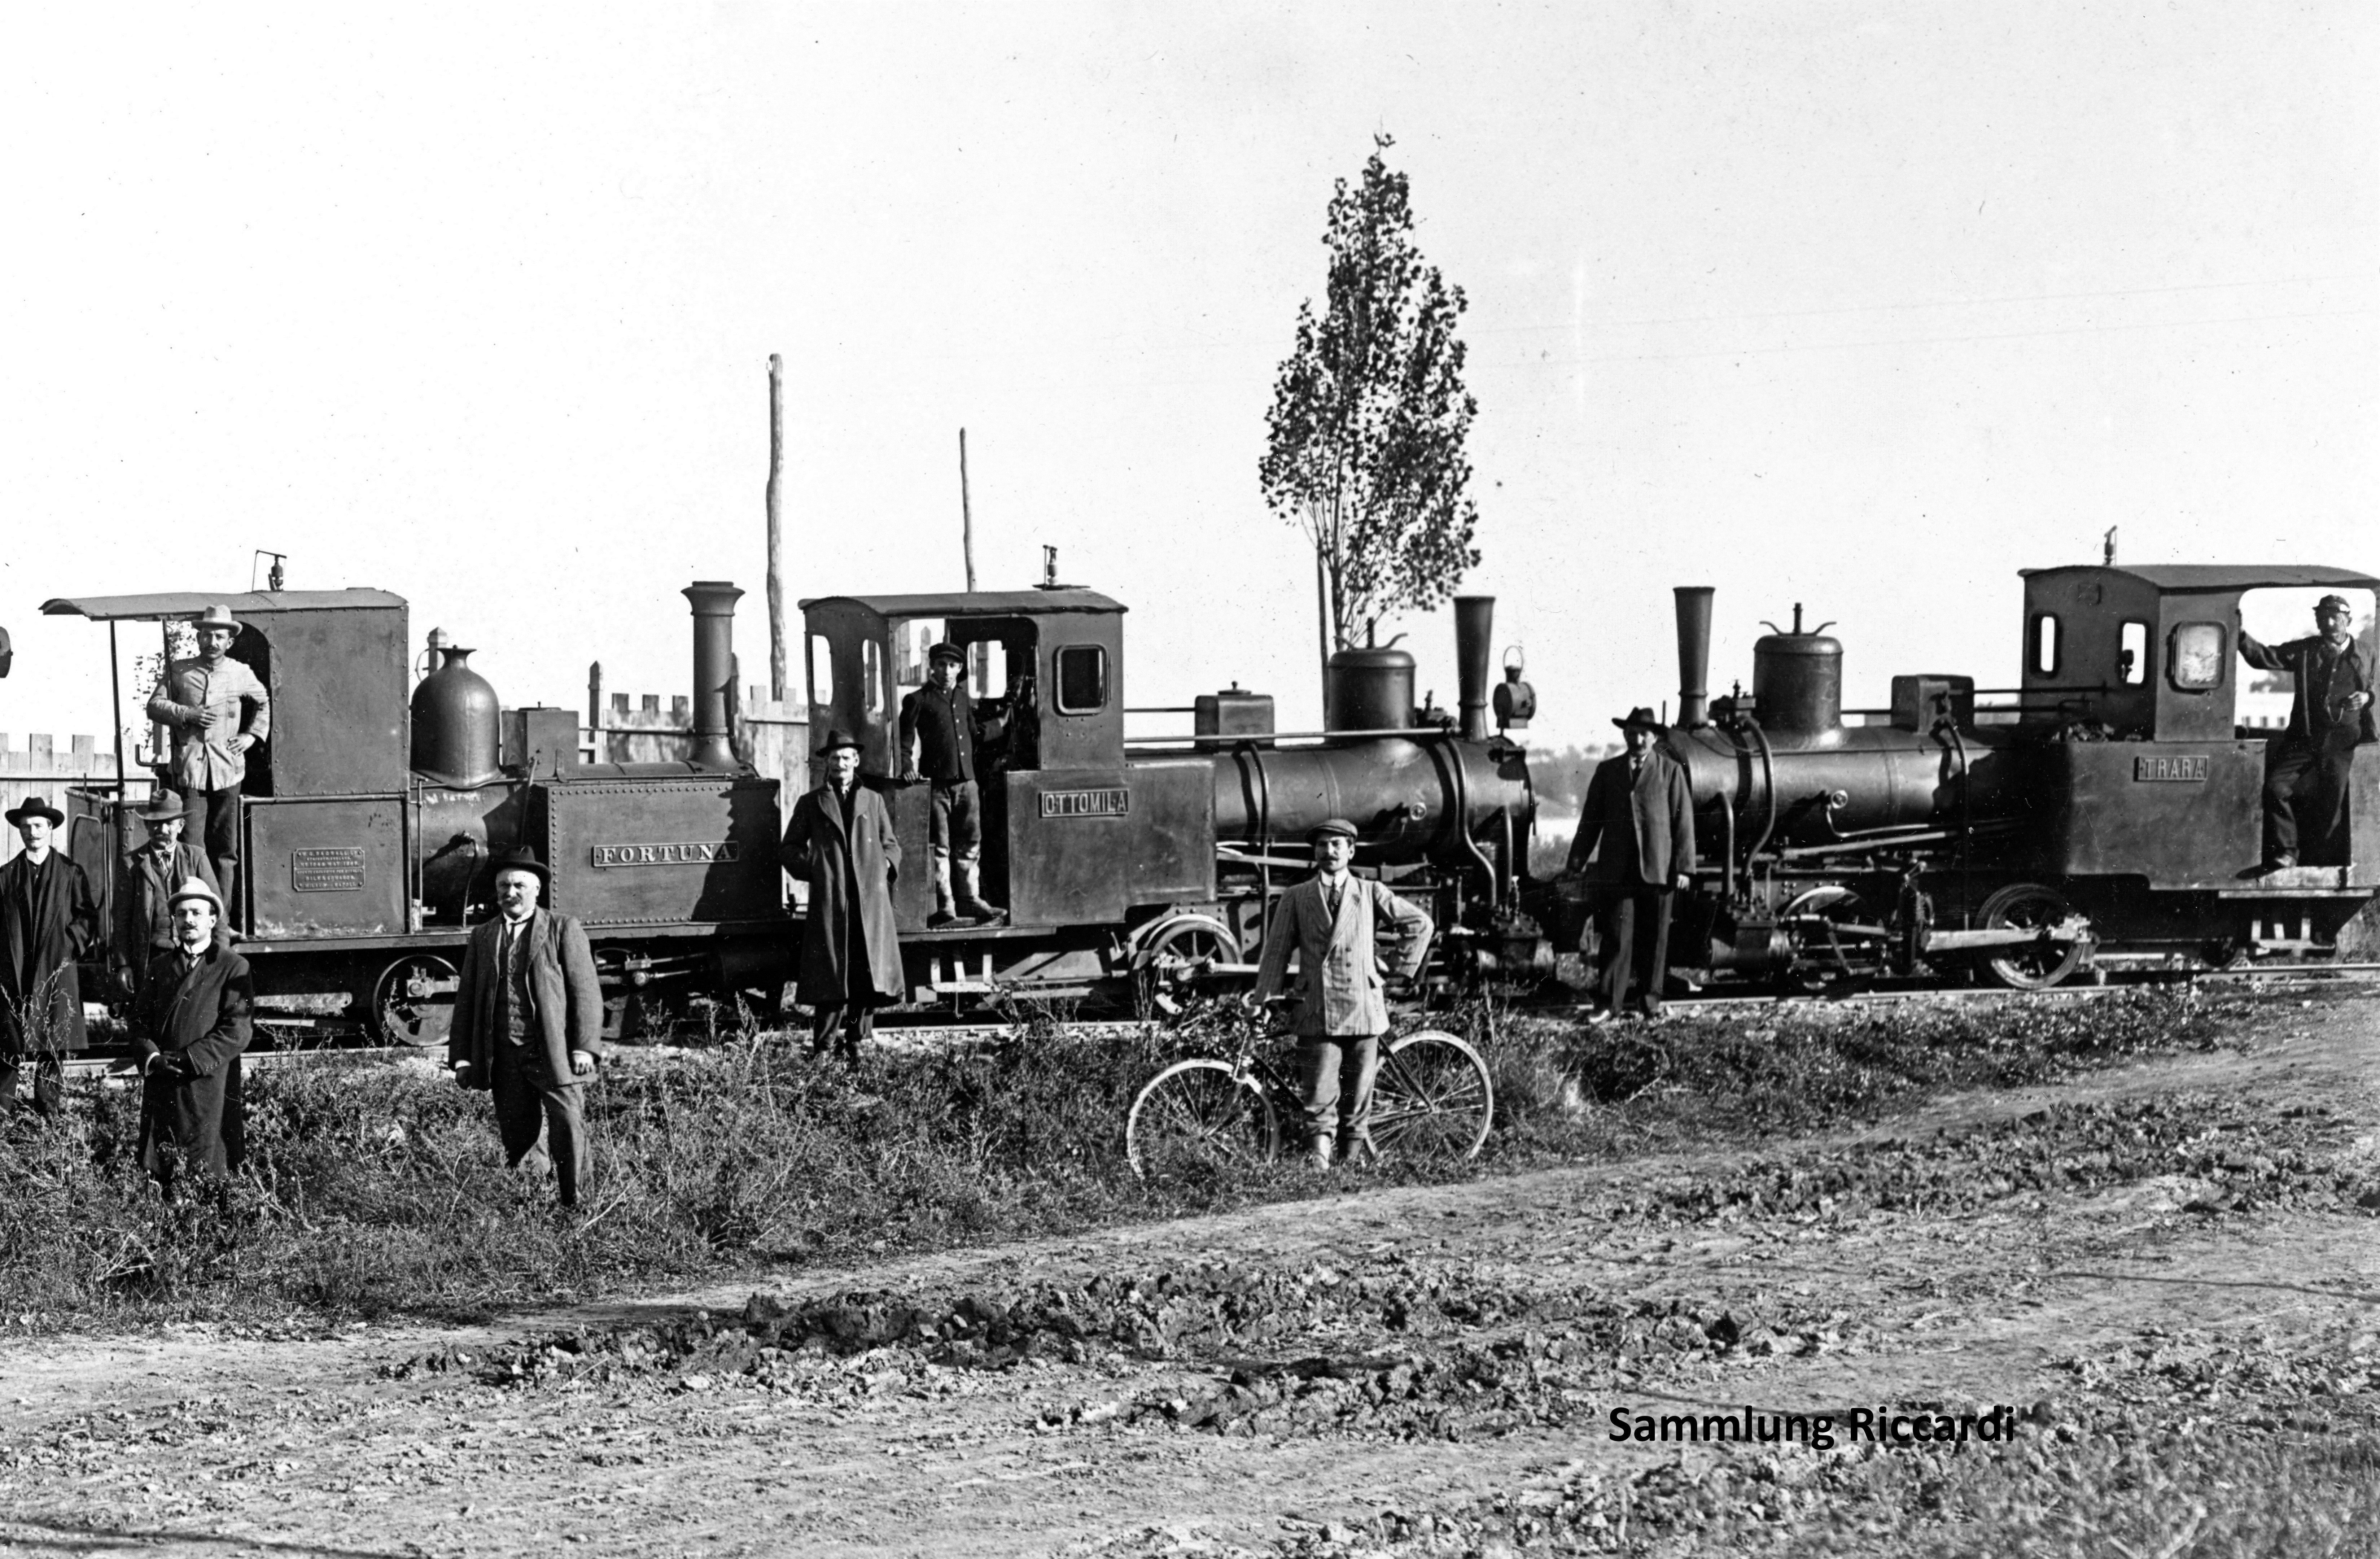 https://img.webme.com/pic/l/lokomotivnamen-locomotivenames/Sammlung%20Riccardi%20015a.jpg